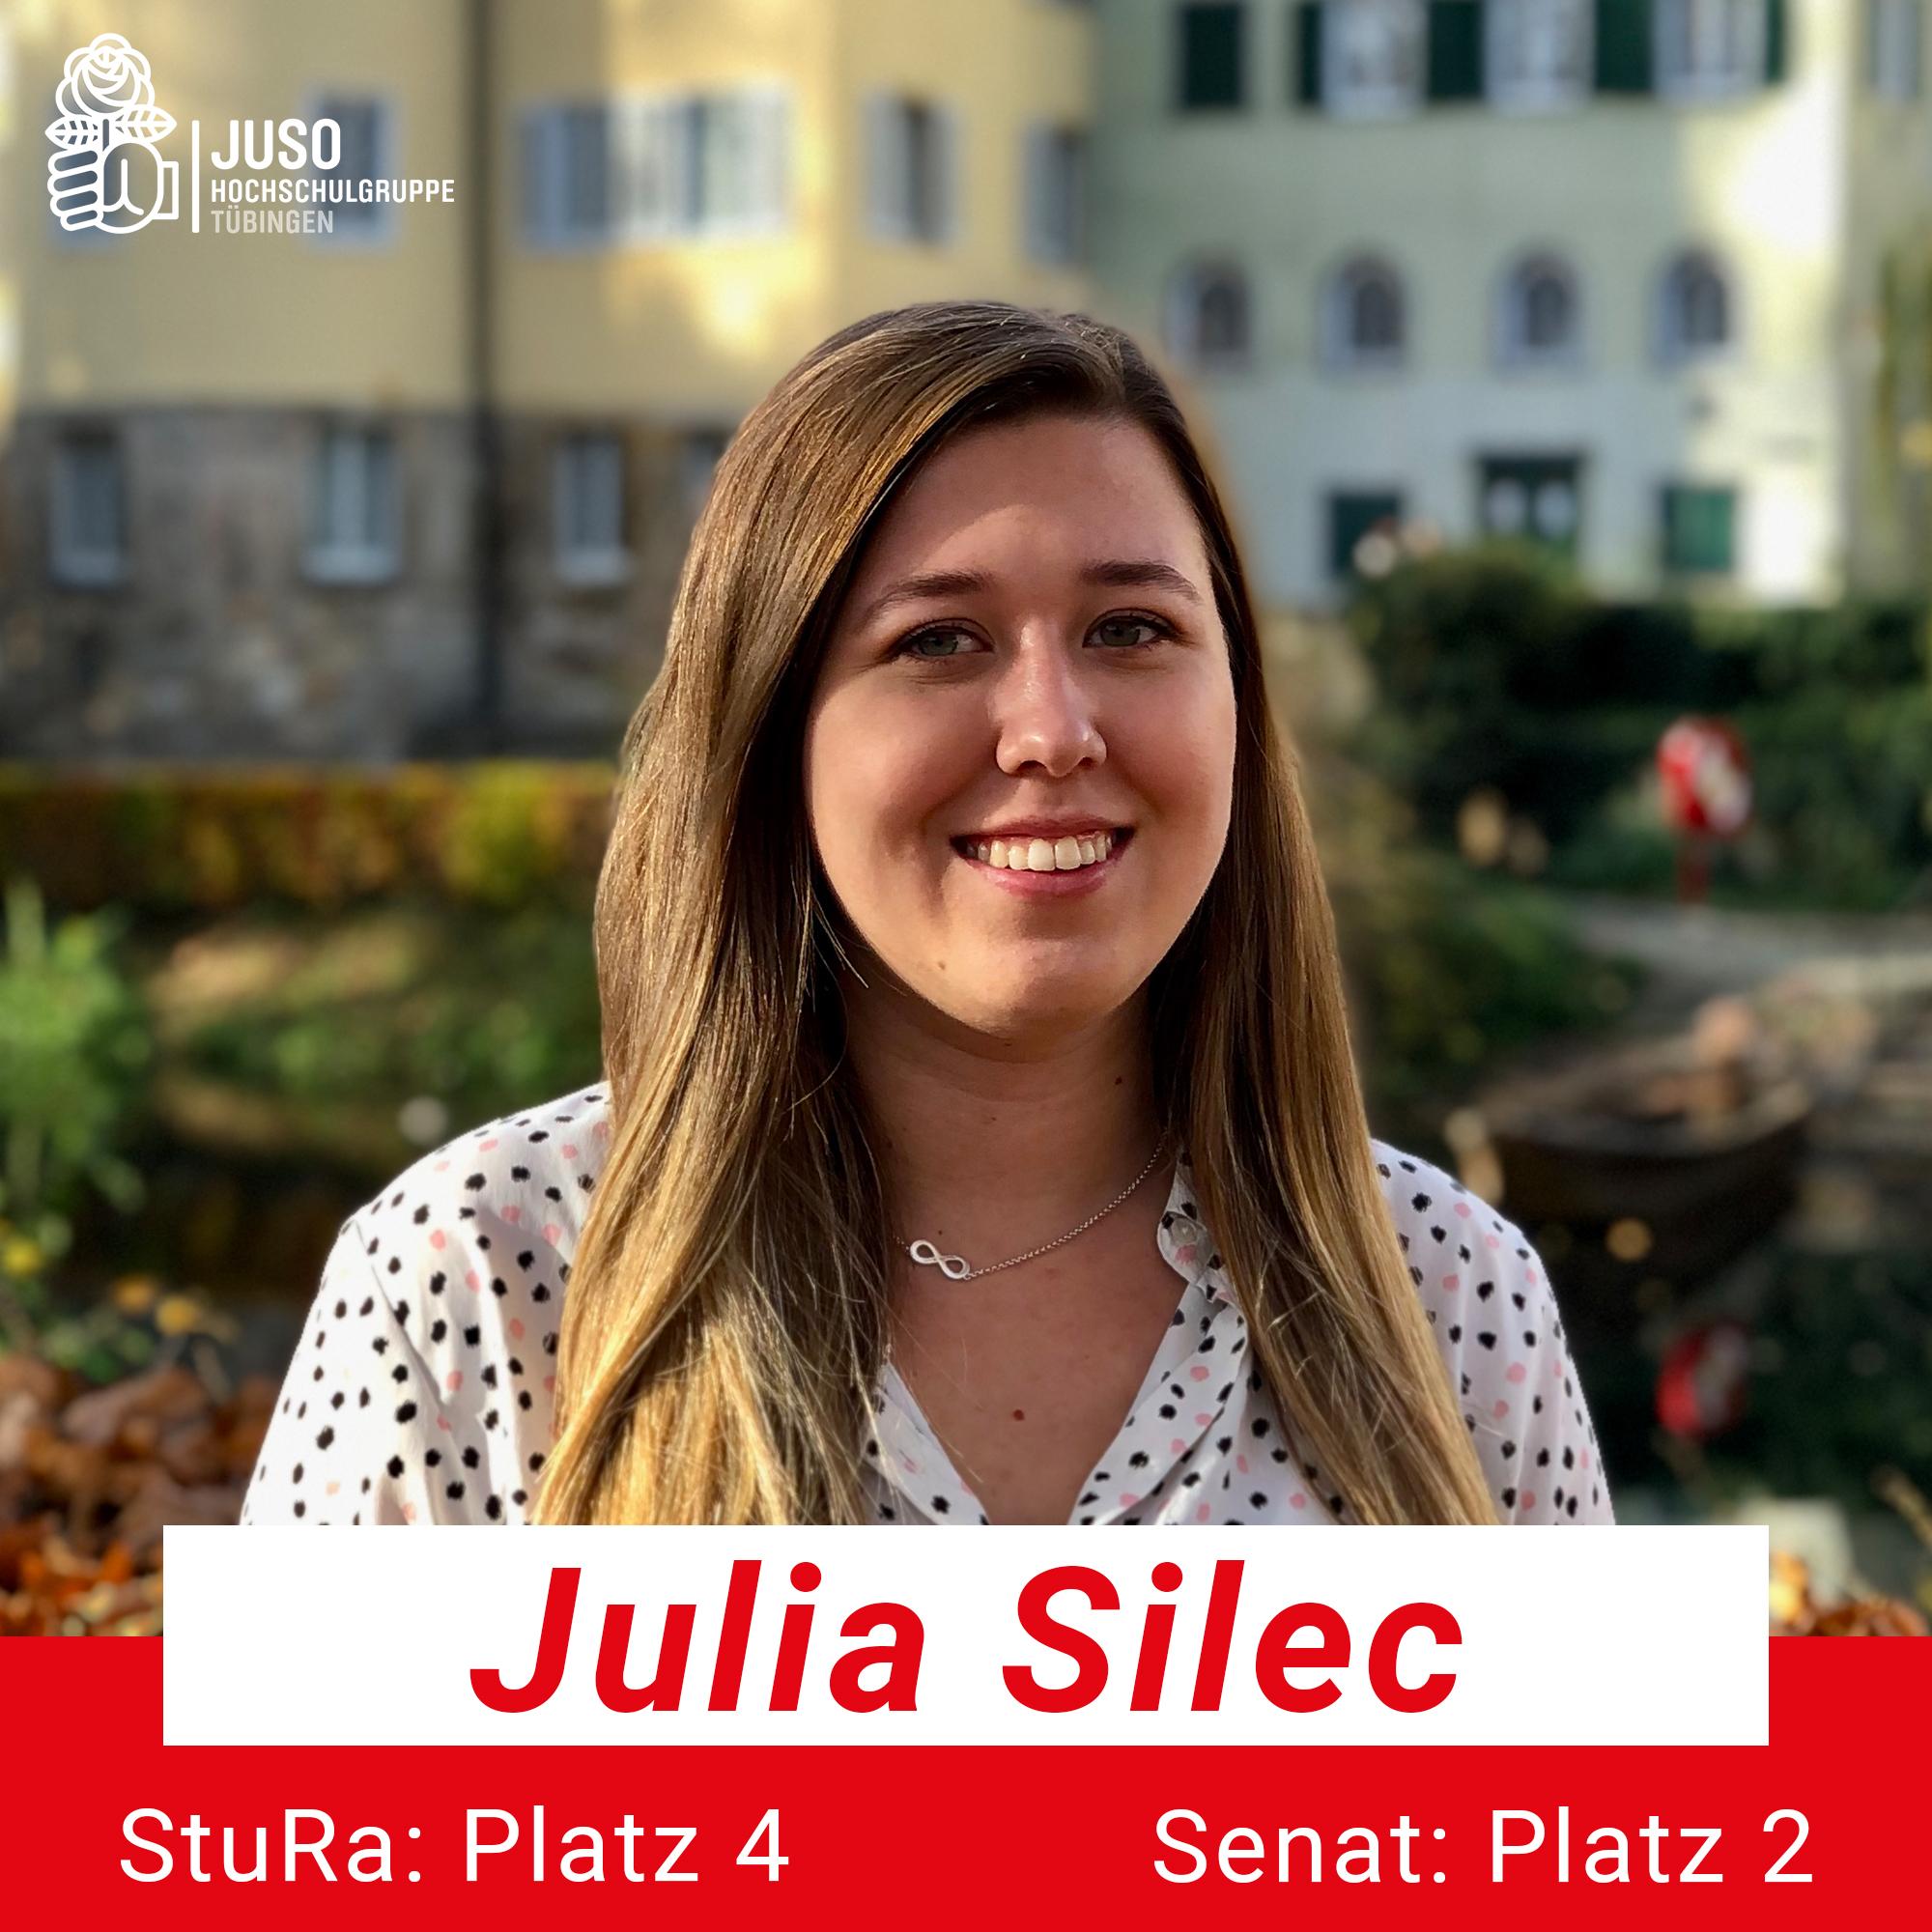 Julia Silec